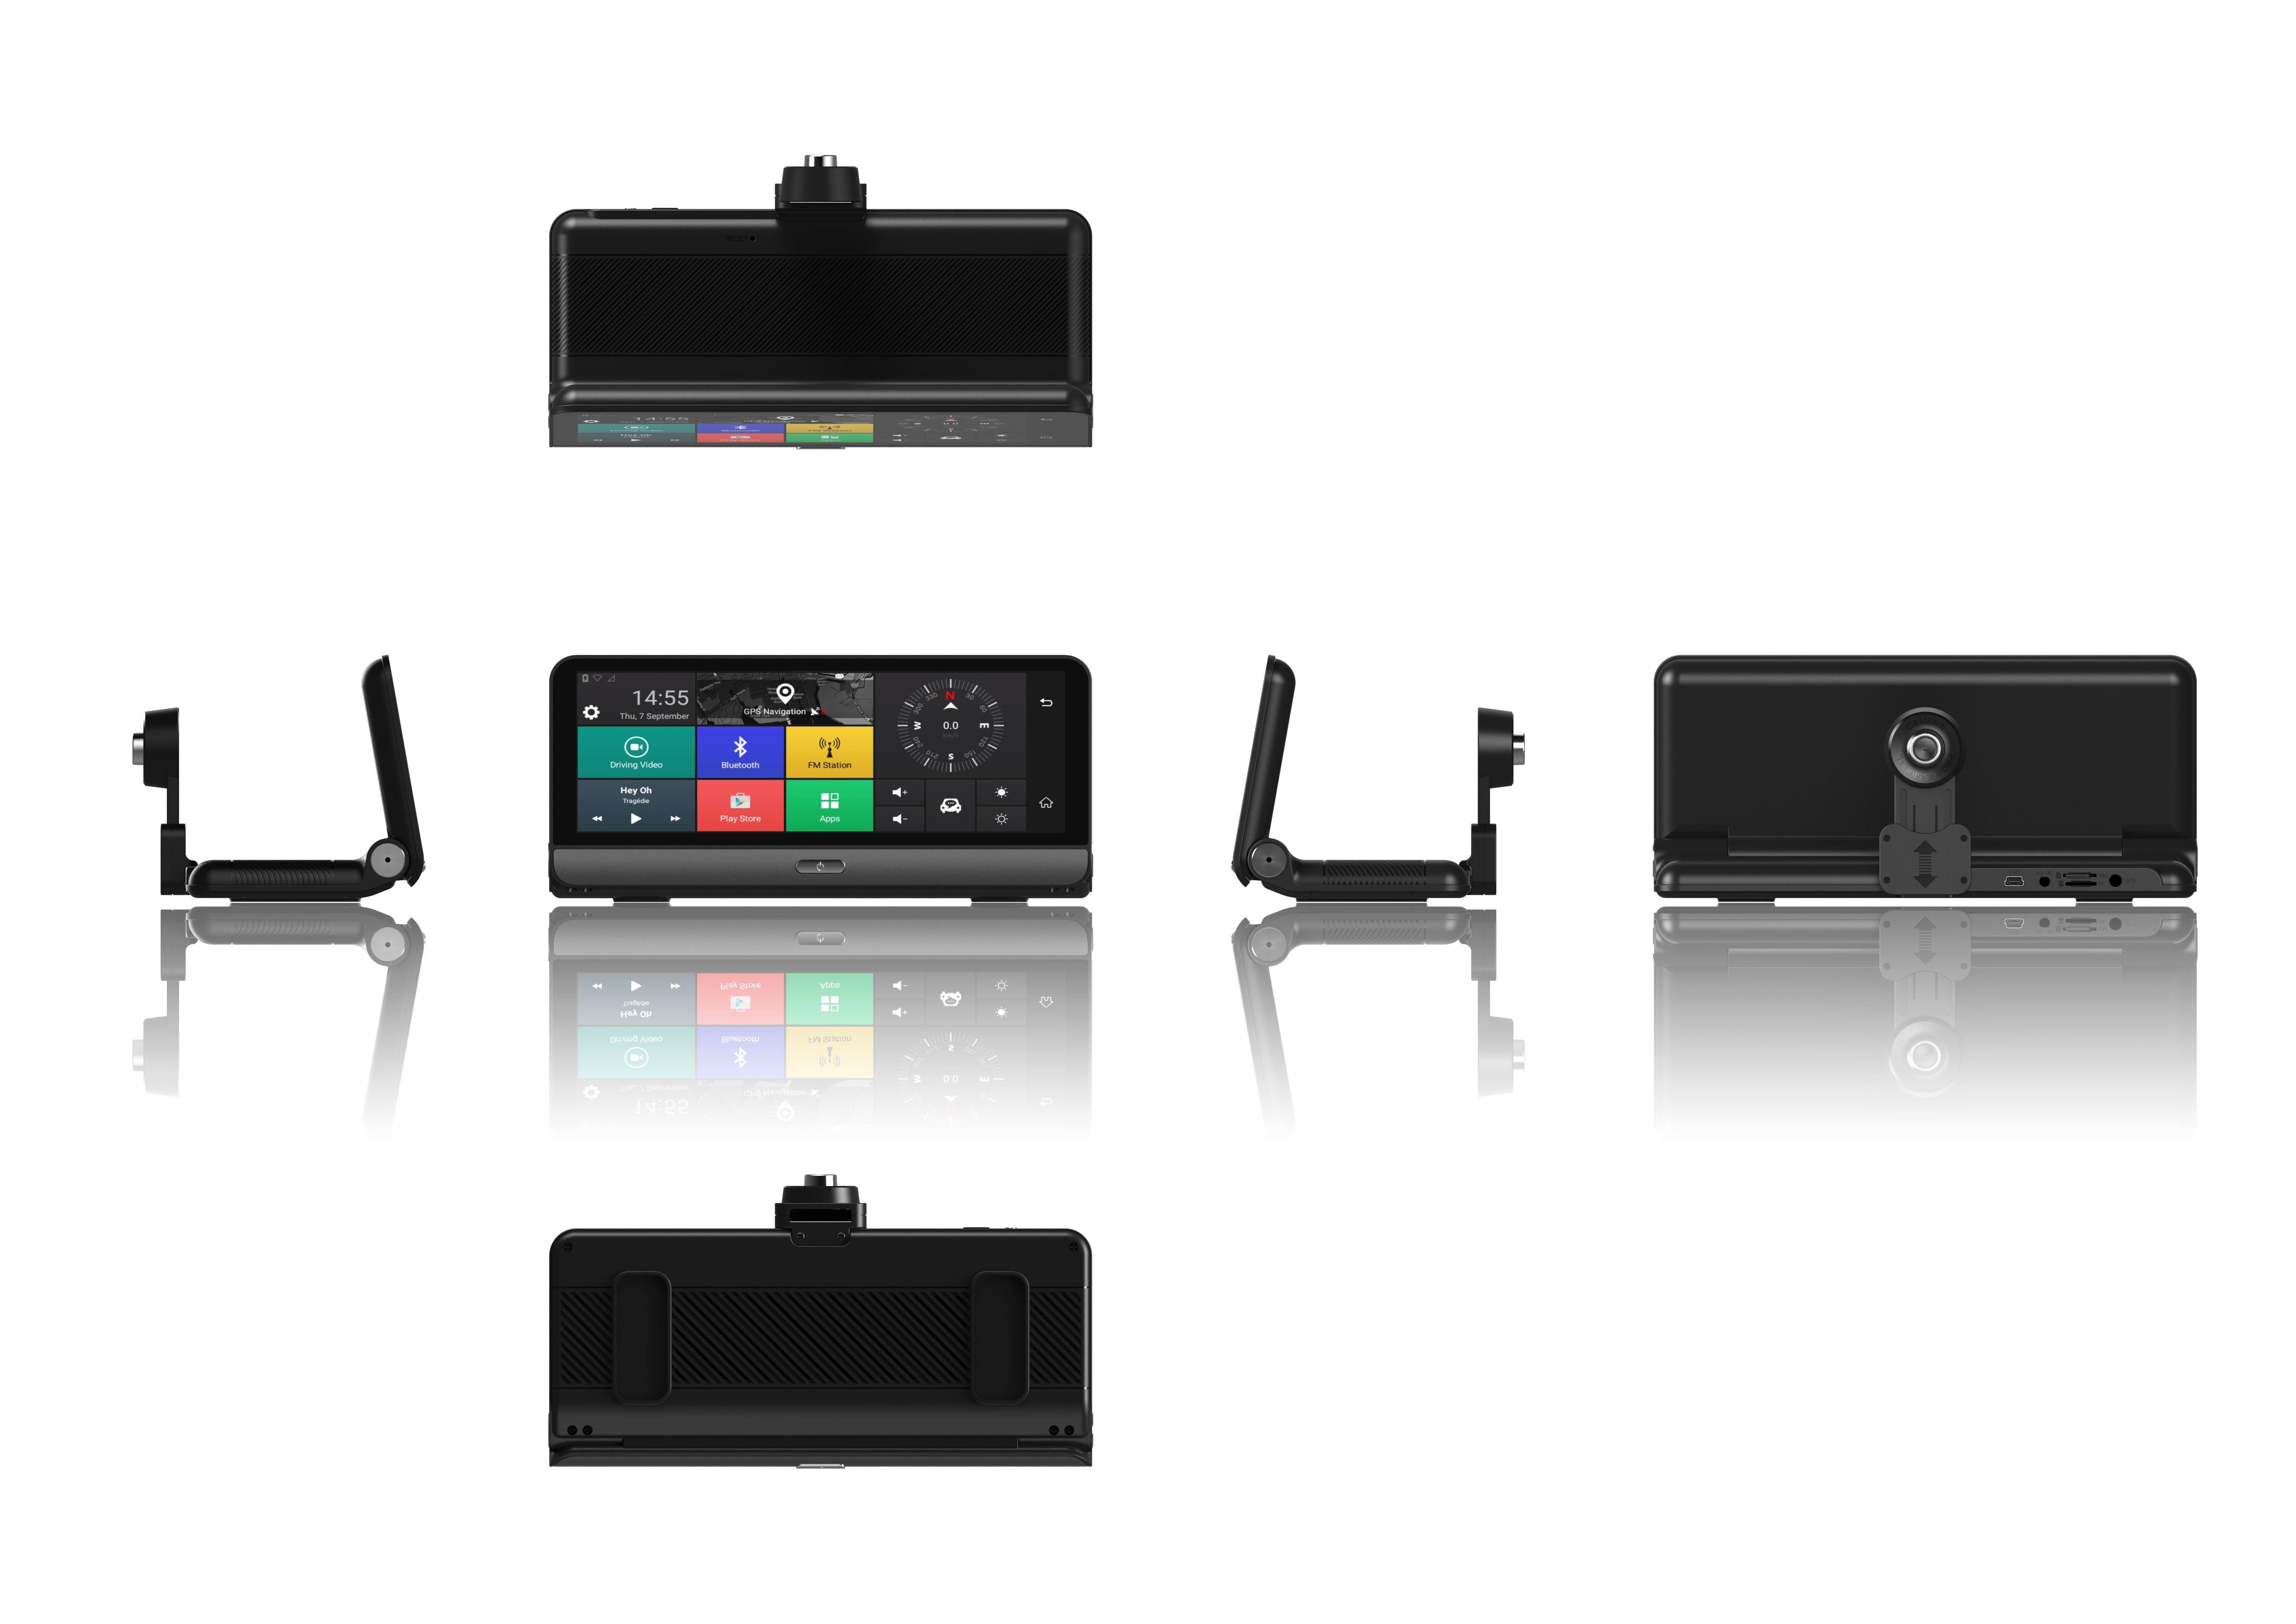 Navigator pentru bord Star E09 DVR 4G, Android 5.0, GPS, 8 inch, 1GB RAM 16GB ROM, Wifi, Bluetooth, Camera fata spate 7